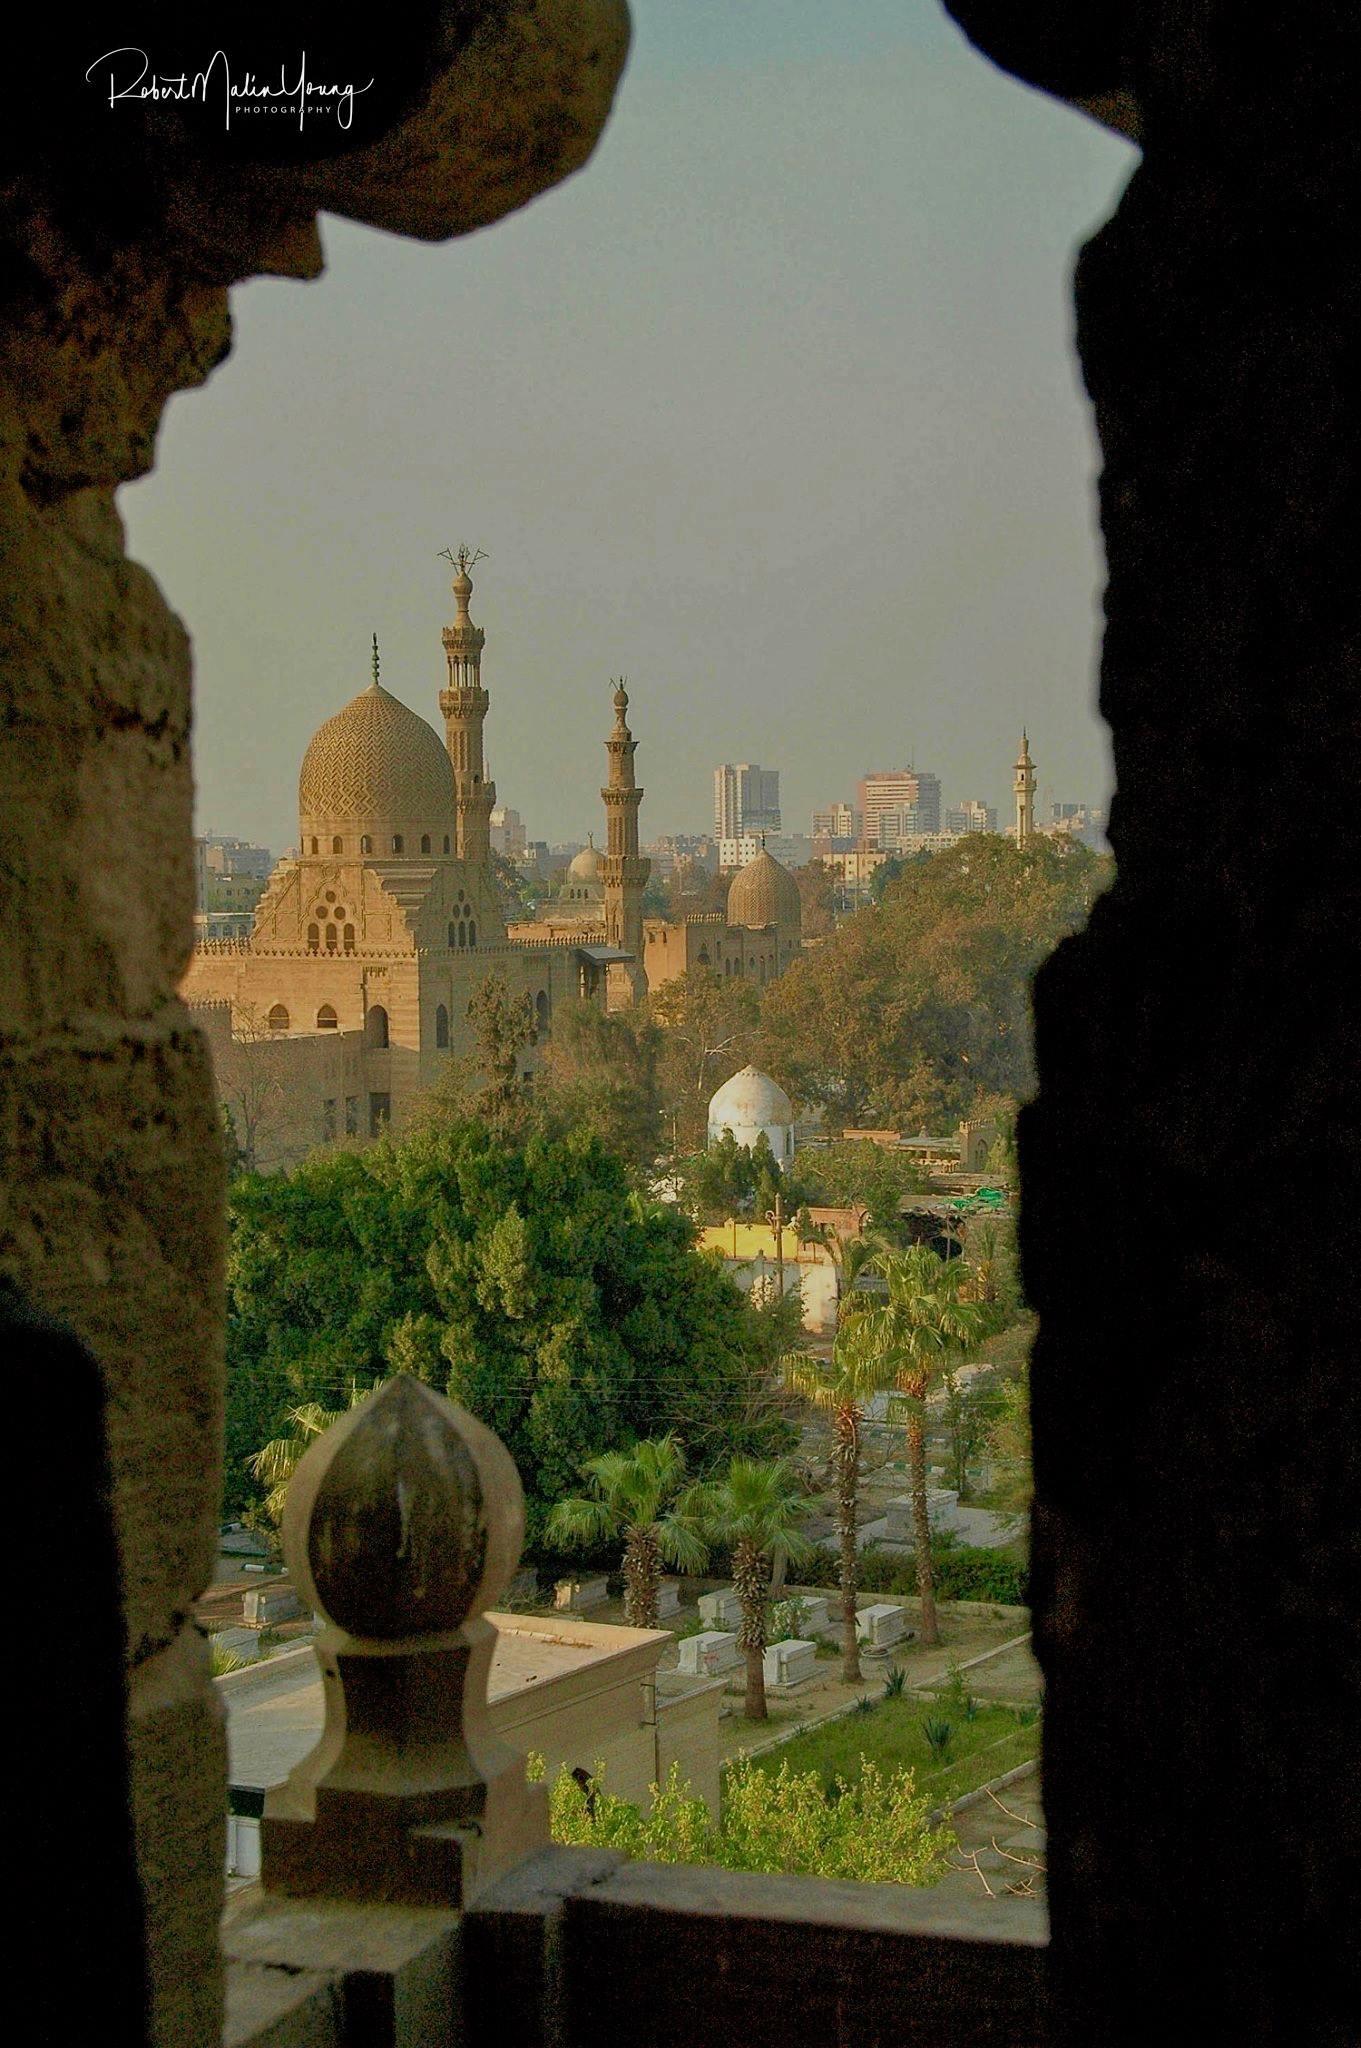 Cairo 2009 by Robert Malin Young